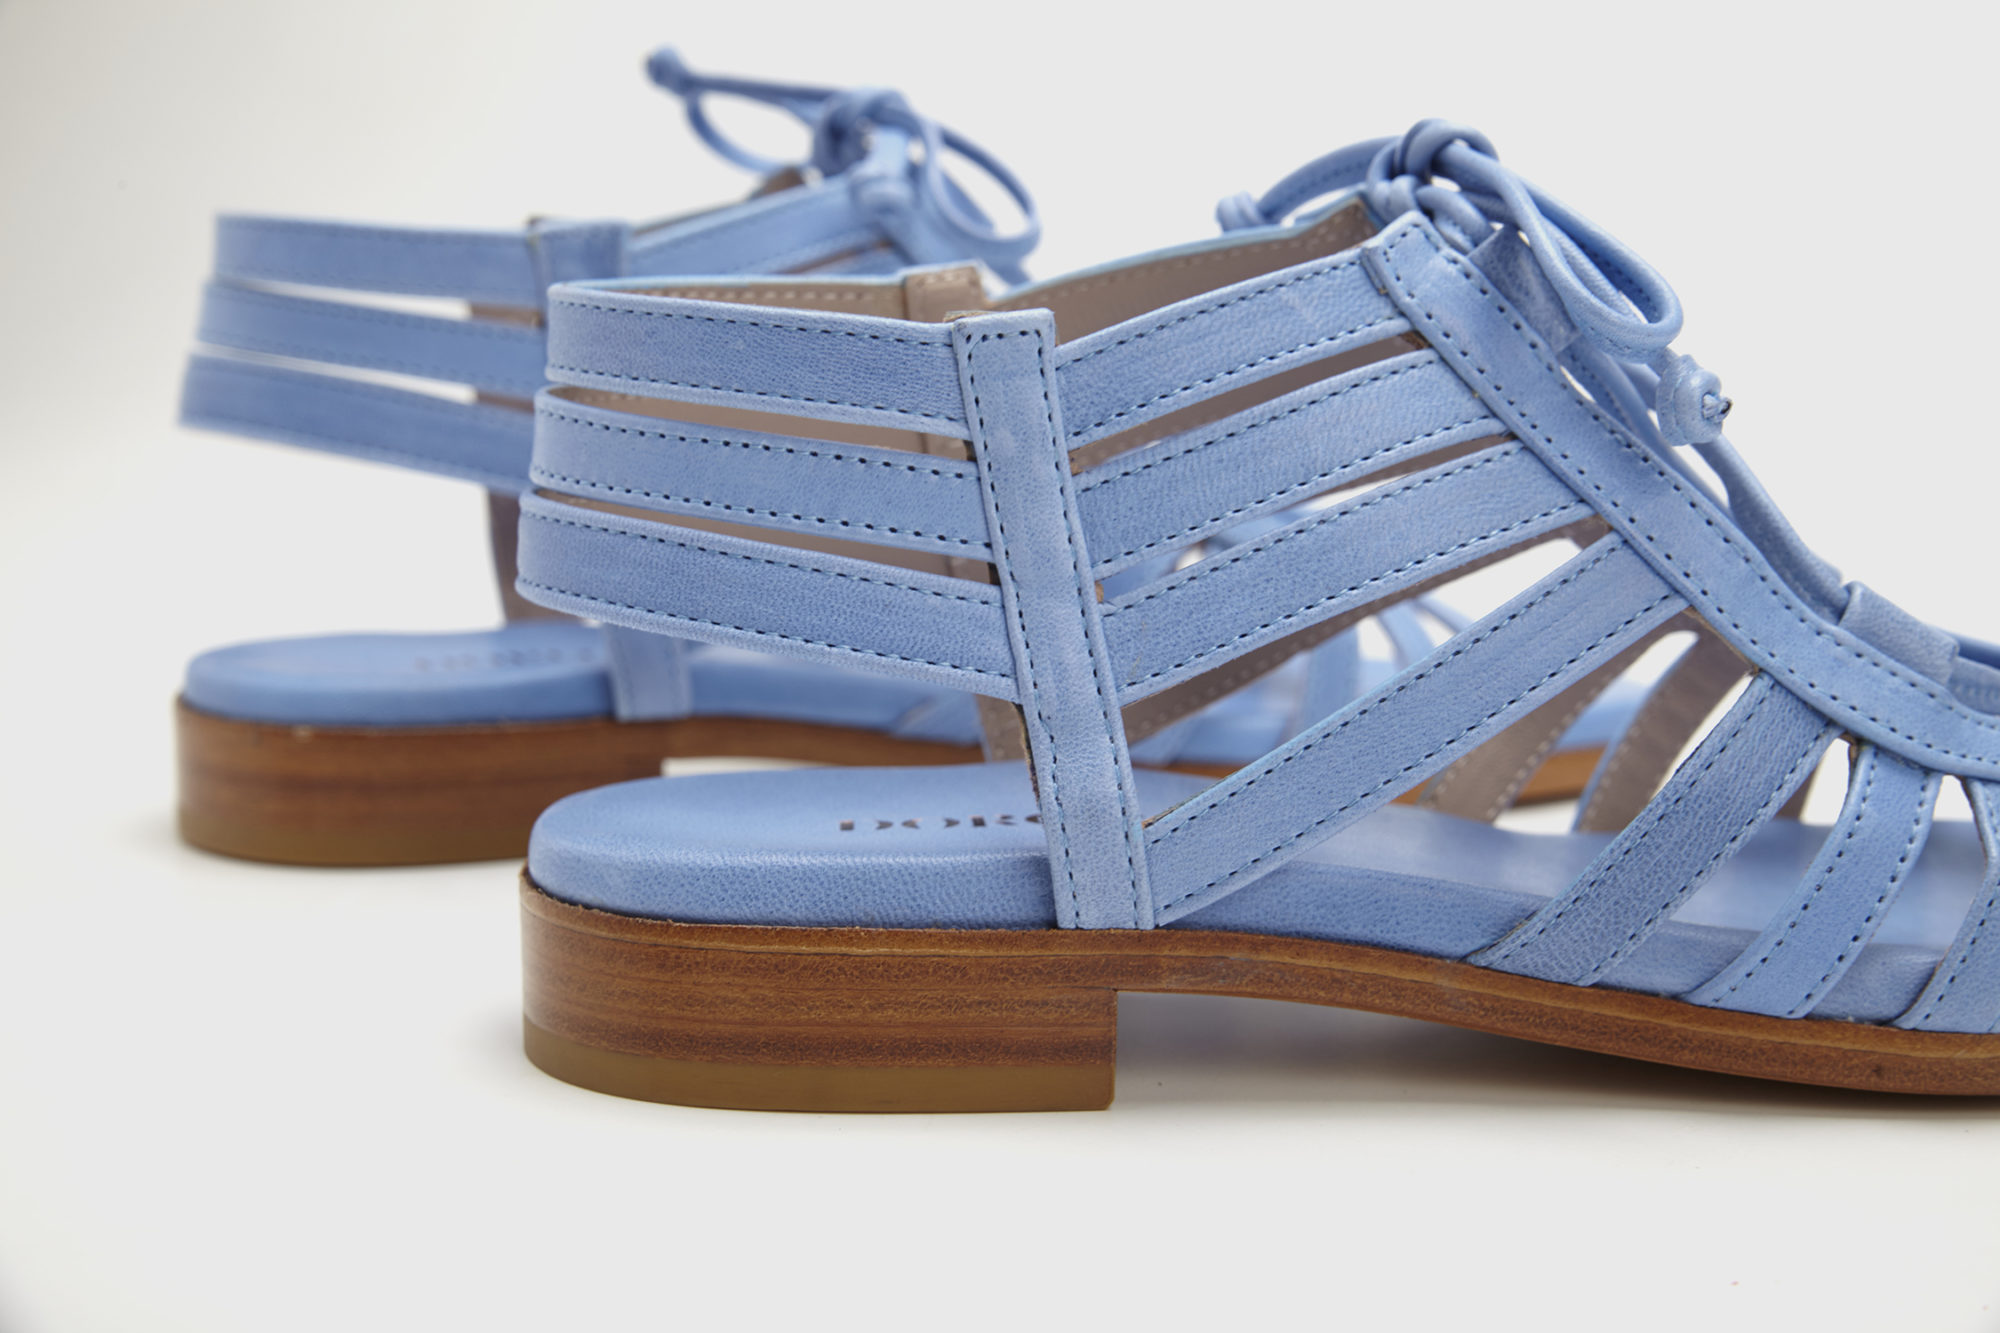 Dorotea sandalia plana Margot azul ss17 detalle